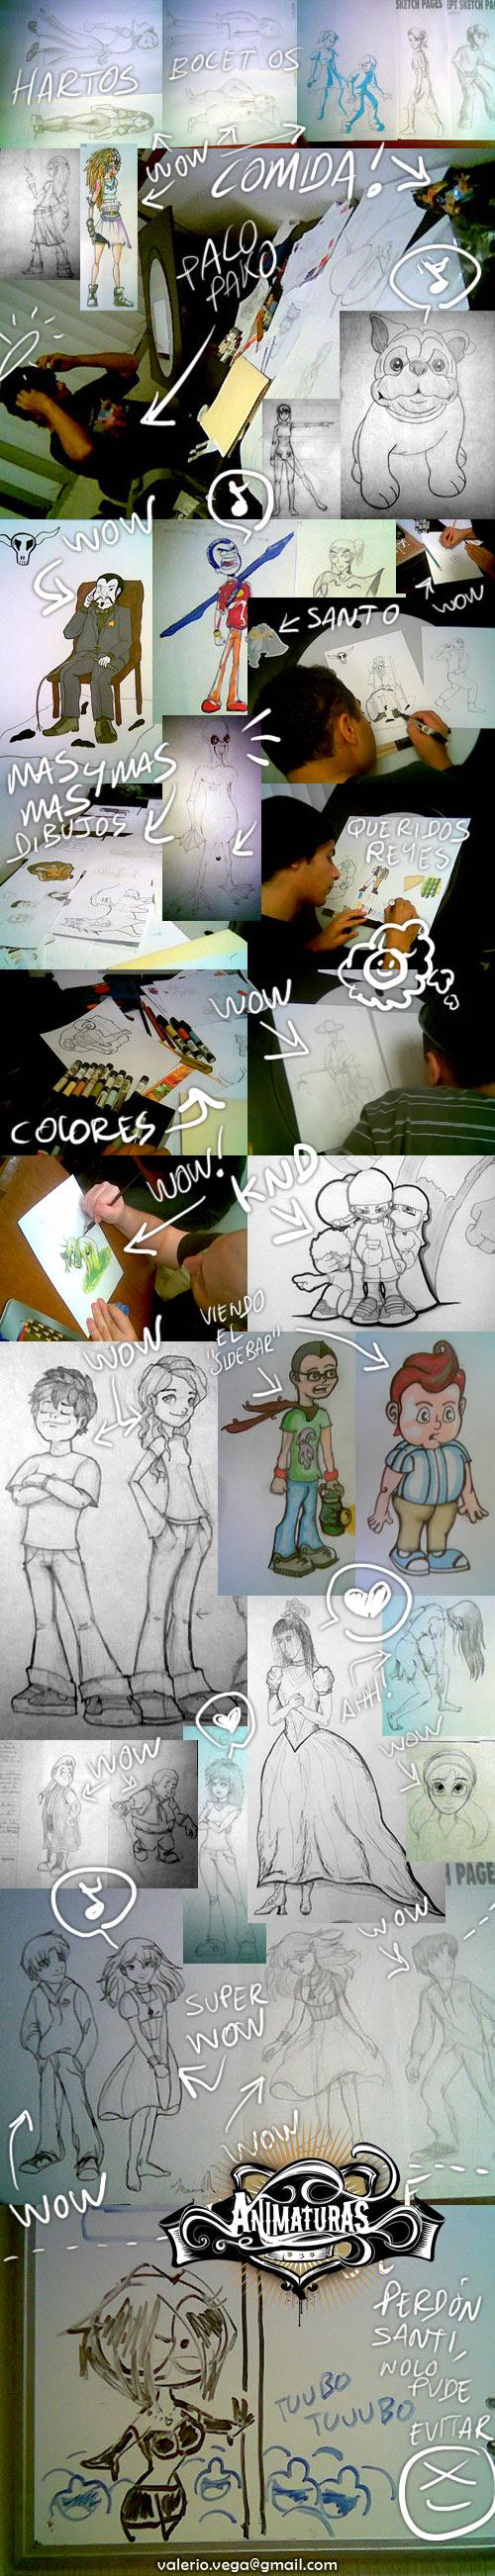 animaturas